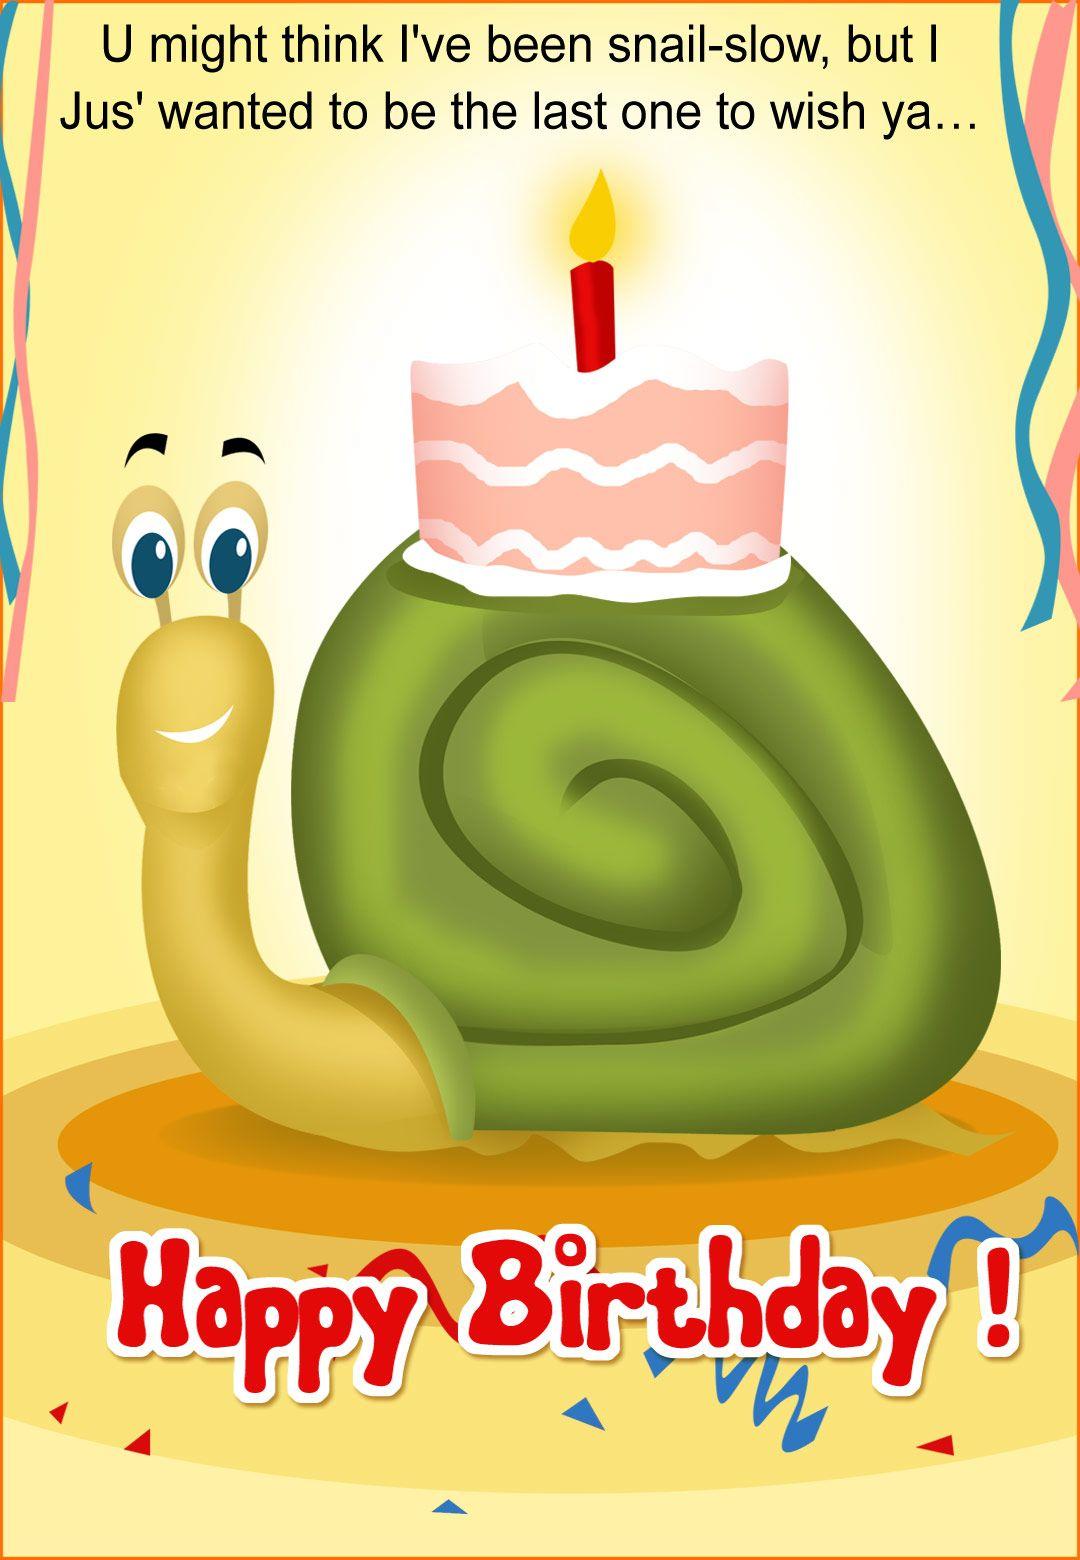 Free printable snail slow greeting card greeting cards